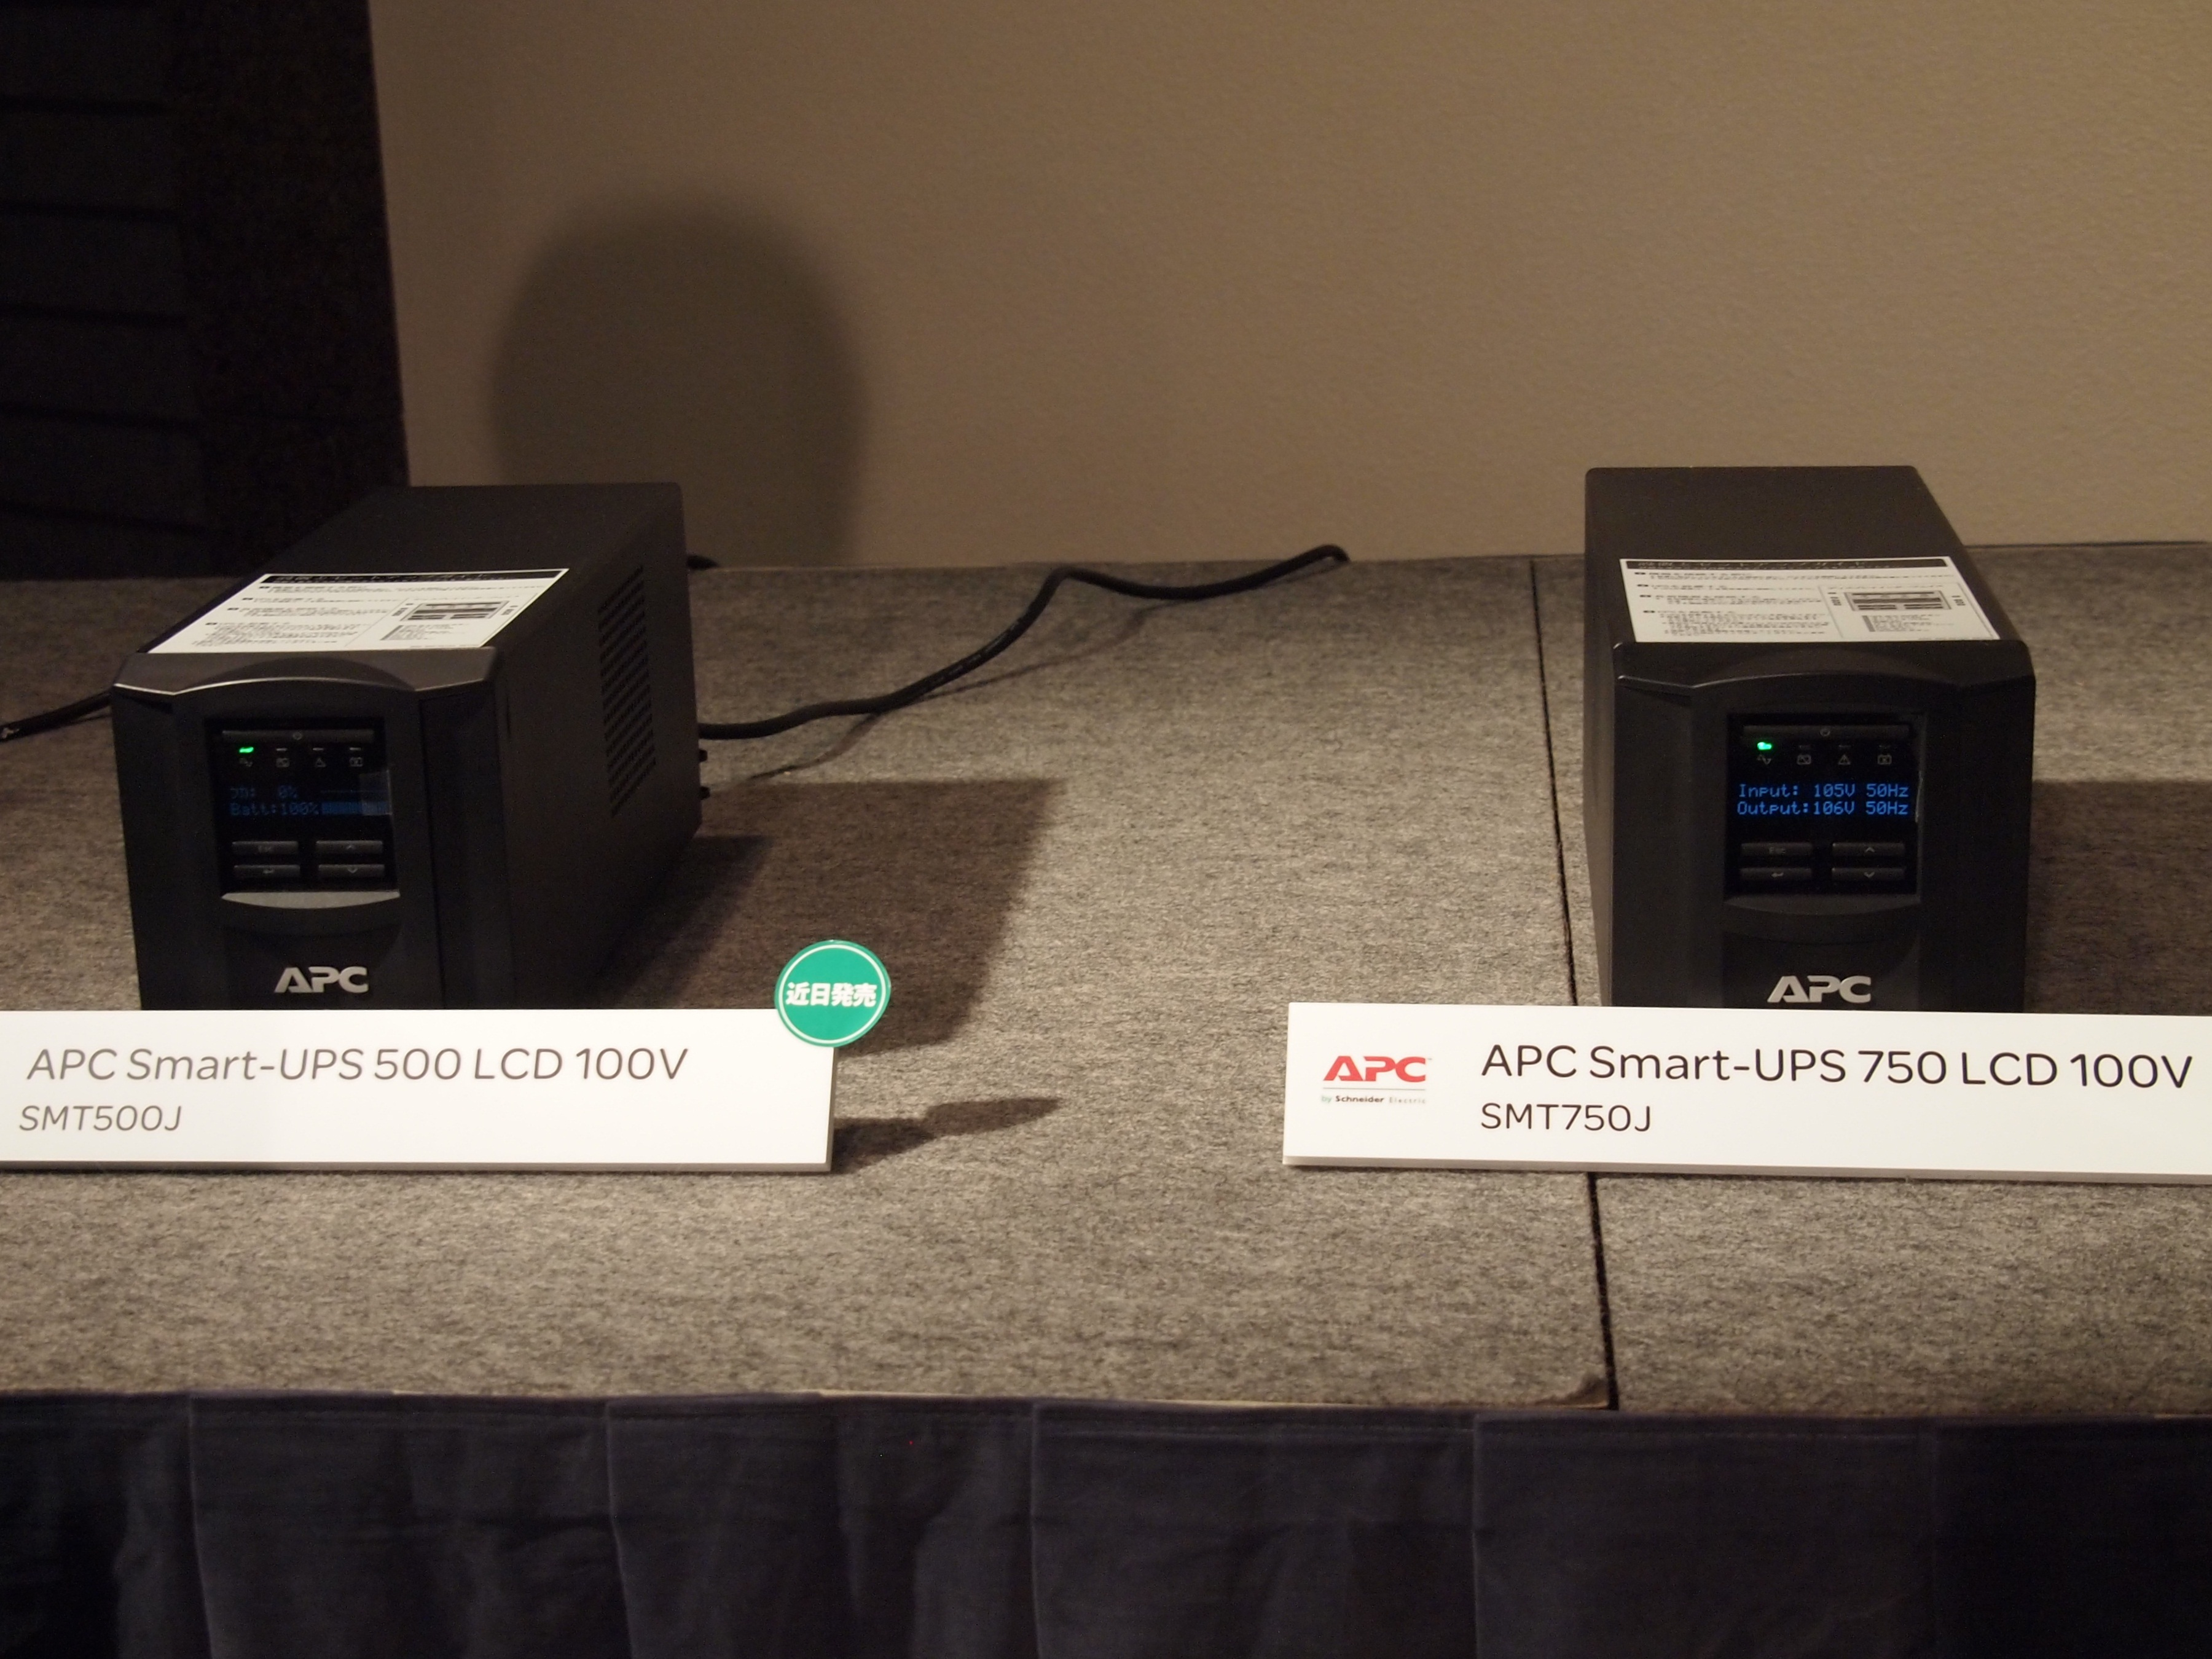 Smart-UPS 500 LCDとSmart-UPS 750 LCD